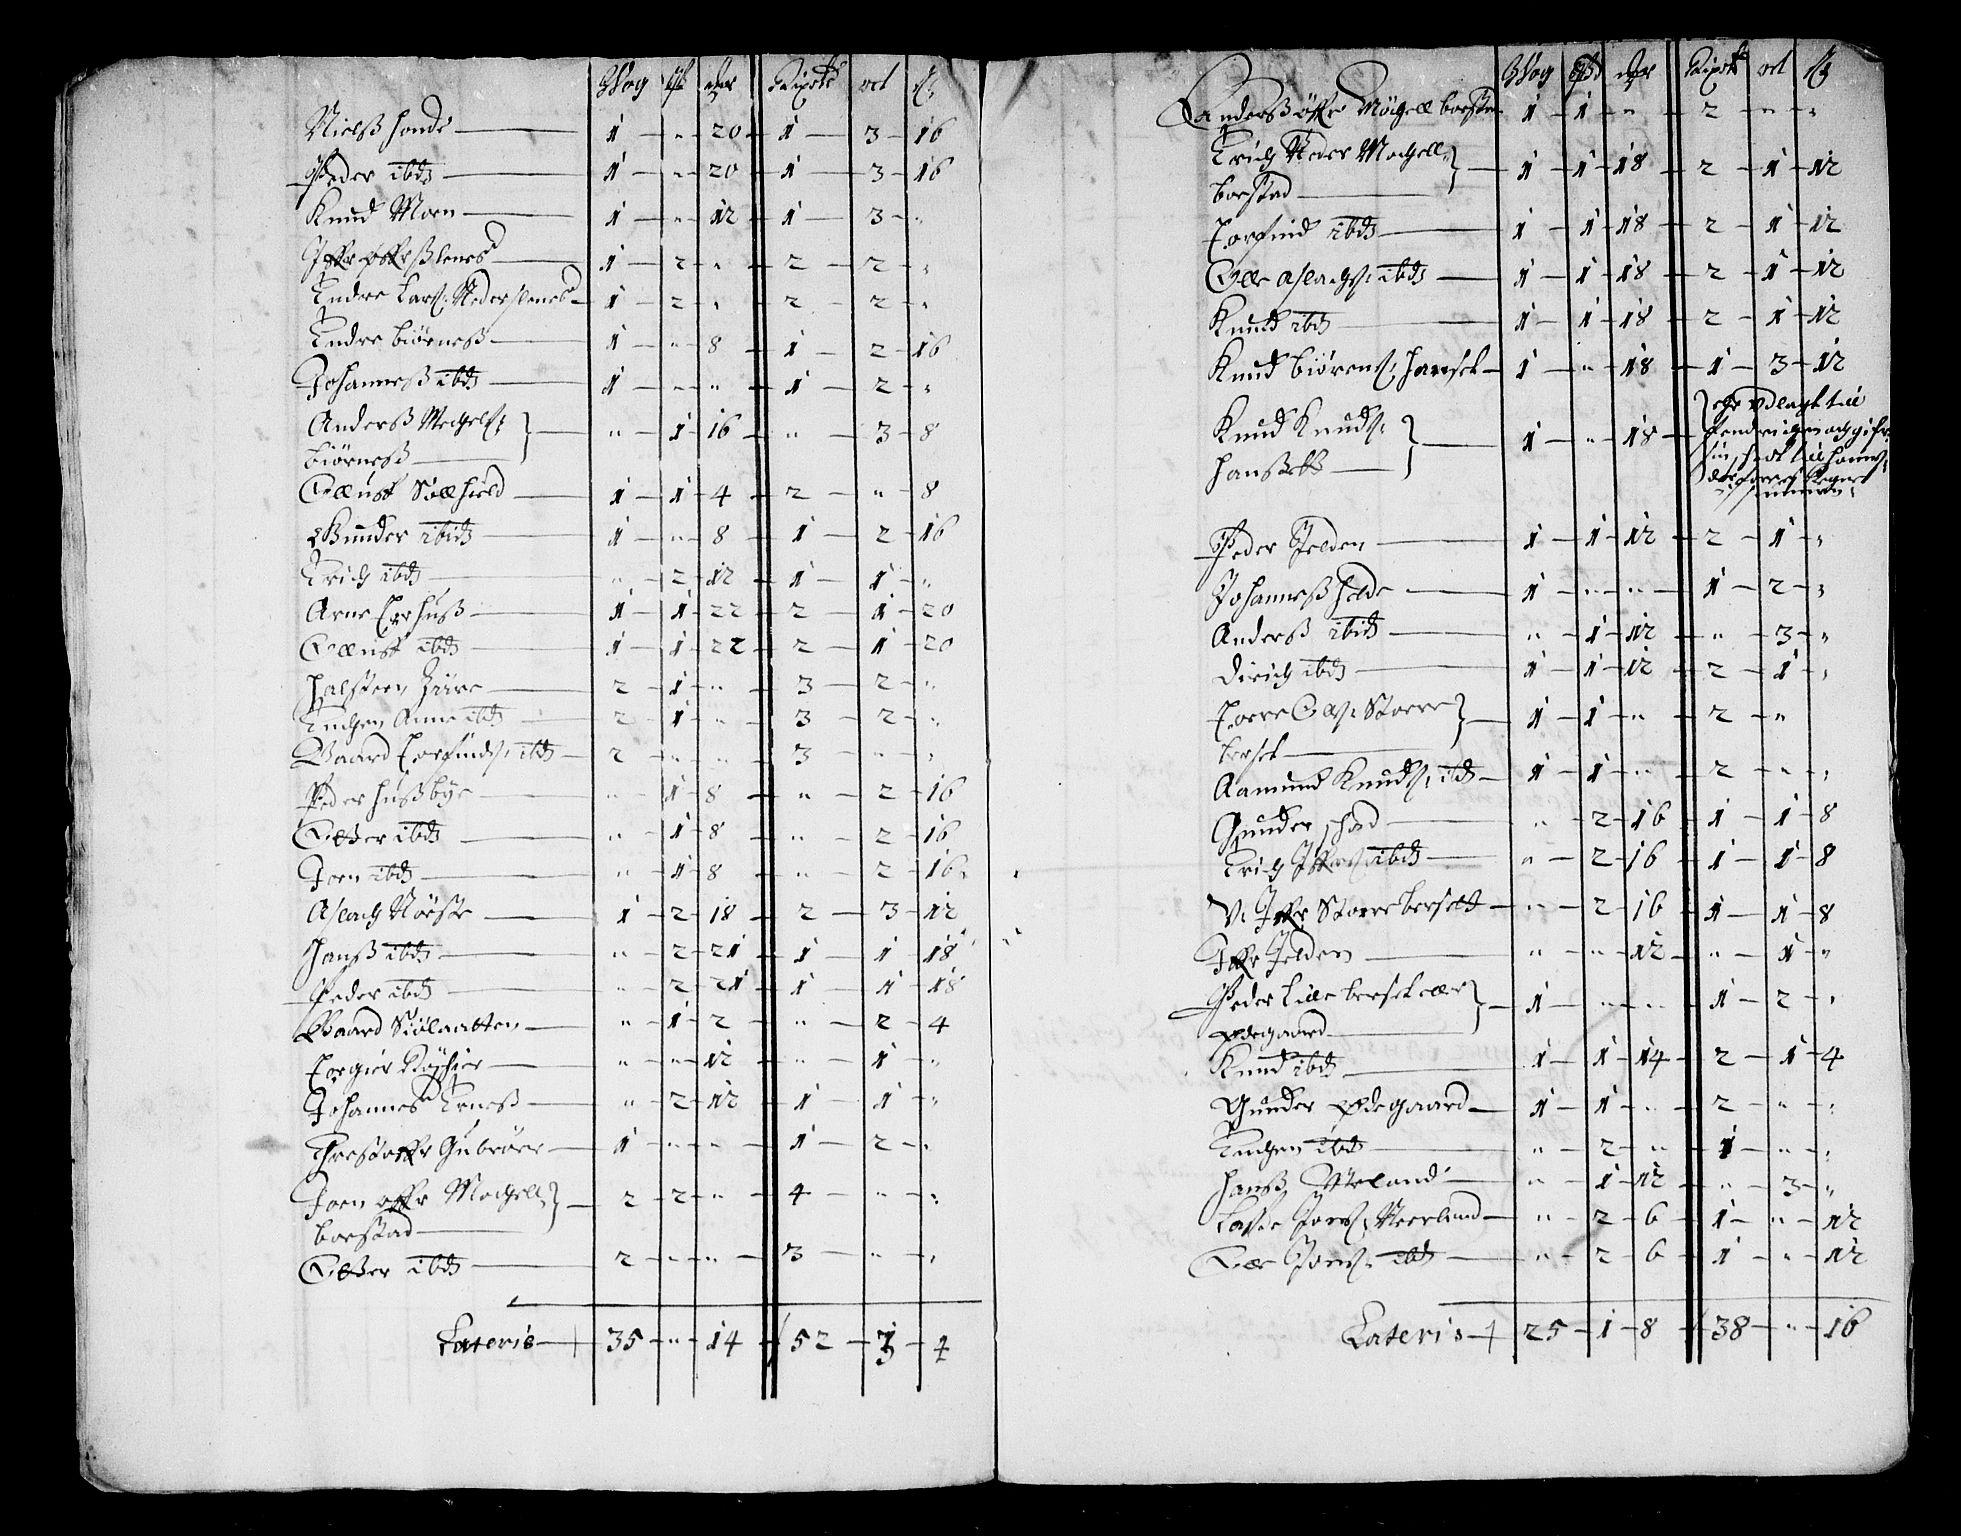 RA, Rentekammeret inntil 1814, Reviderte regnskaper, Stiftamtstueregnskaper, Trondheim stiftamt og Nordland amt, R/Rd/L0037: Trondheim stiftamt, 1673